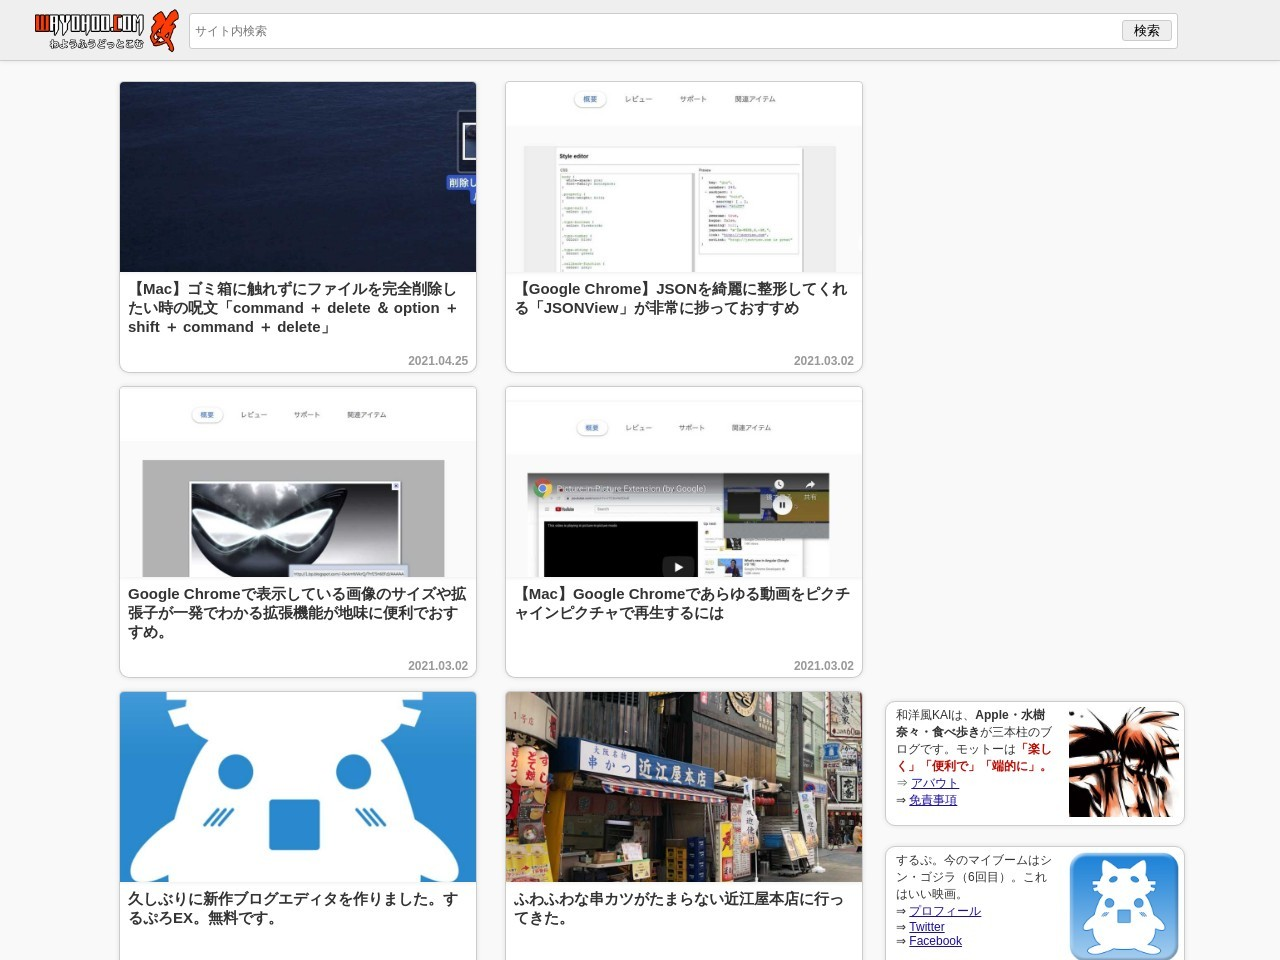 http://wayohoo.com/mac/accessories/hdpe-ut1-0.html